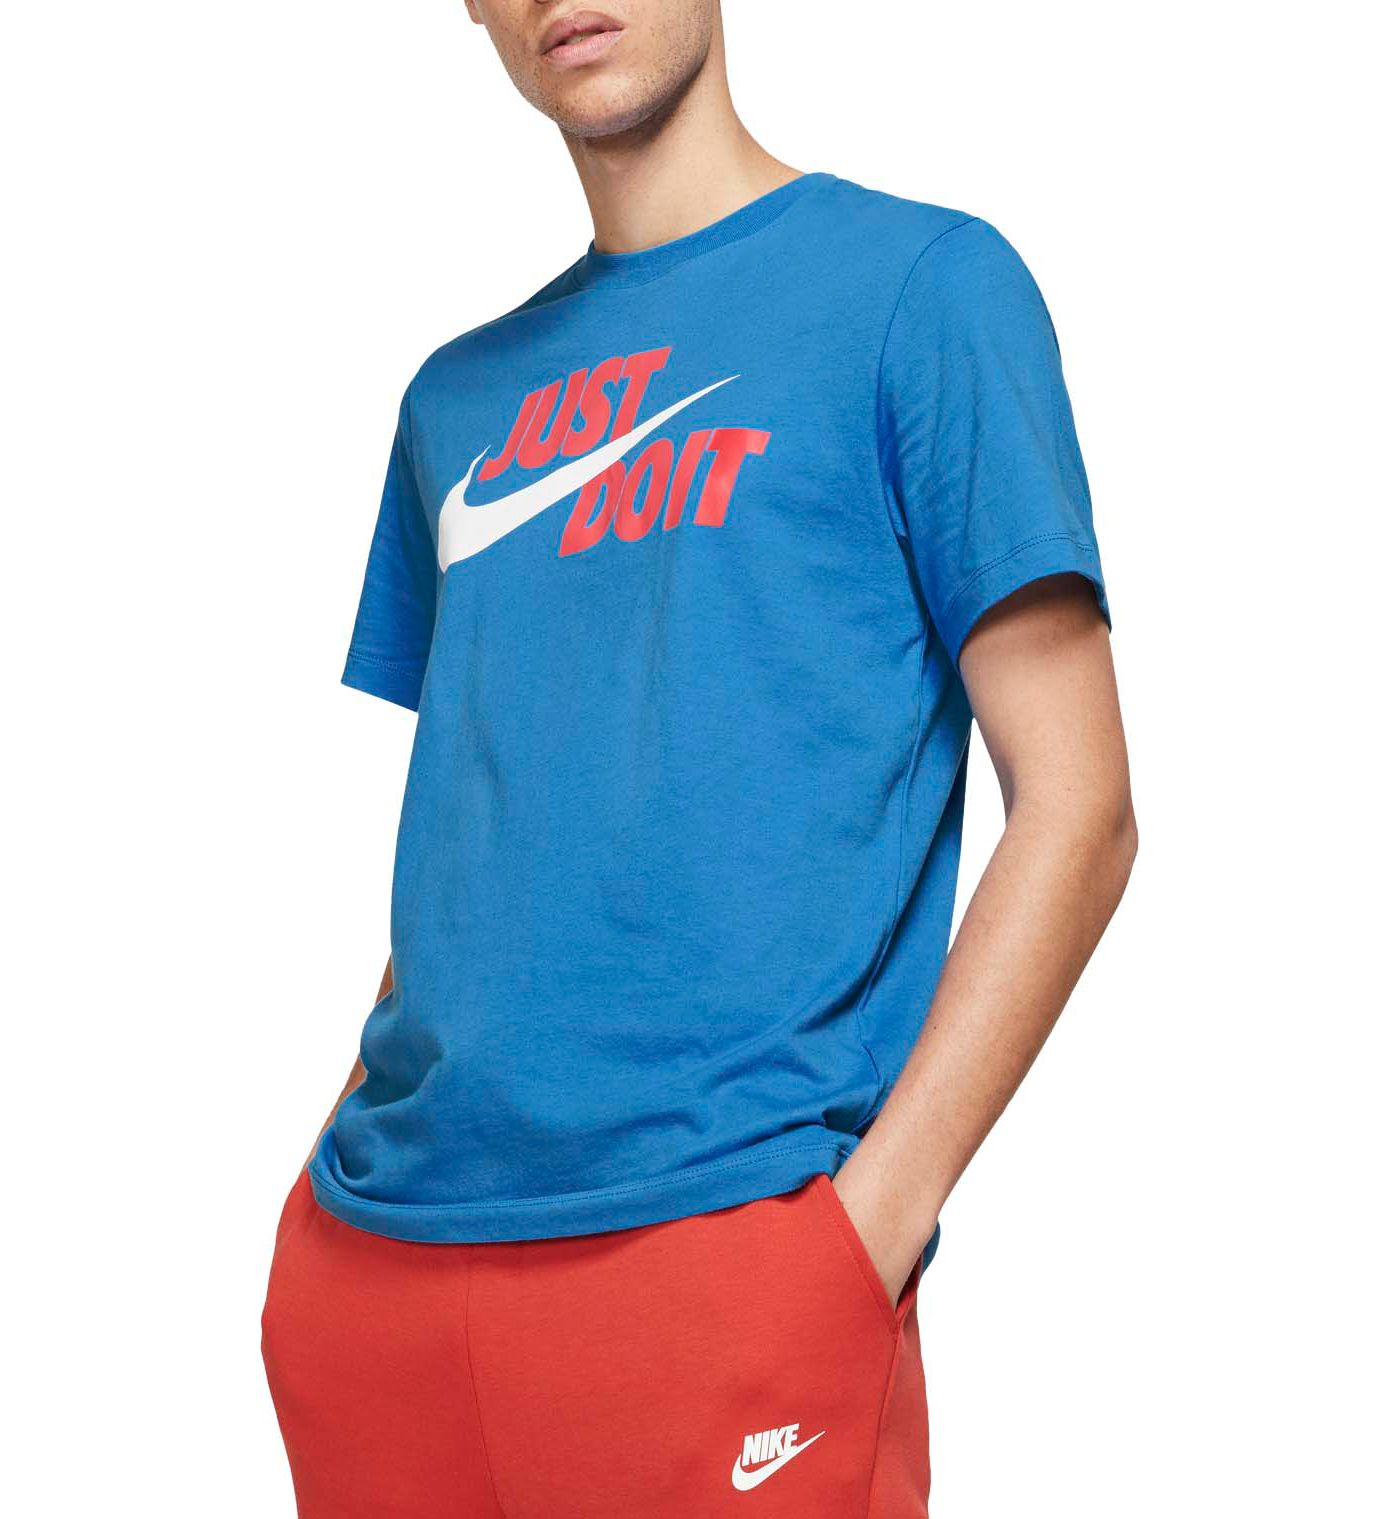 Nike Men's Sportswear Just Do It Graphic T-Shirt